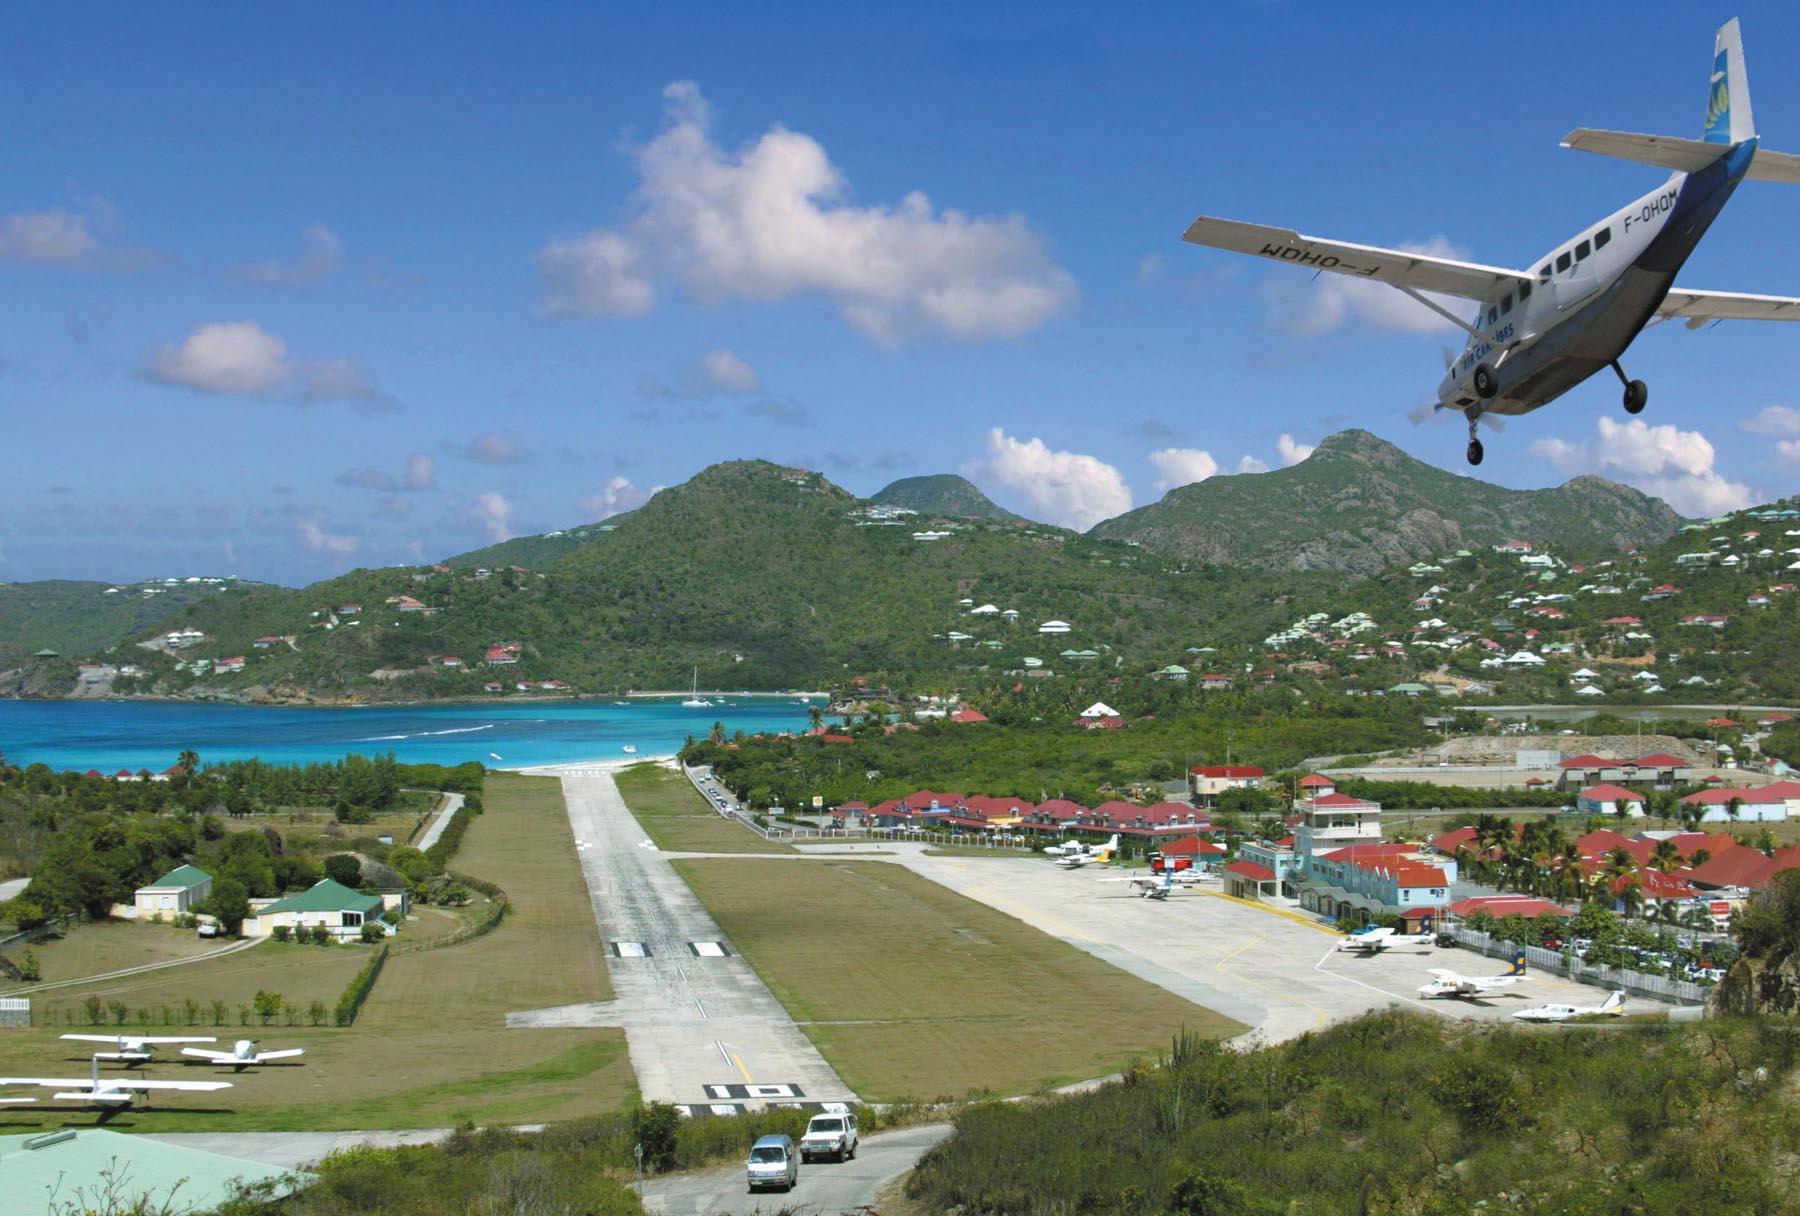 Аэропорт Густаф III в Сент-Бартелеми